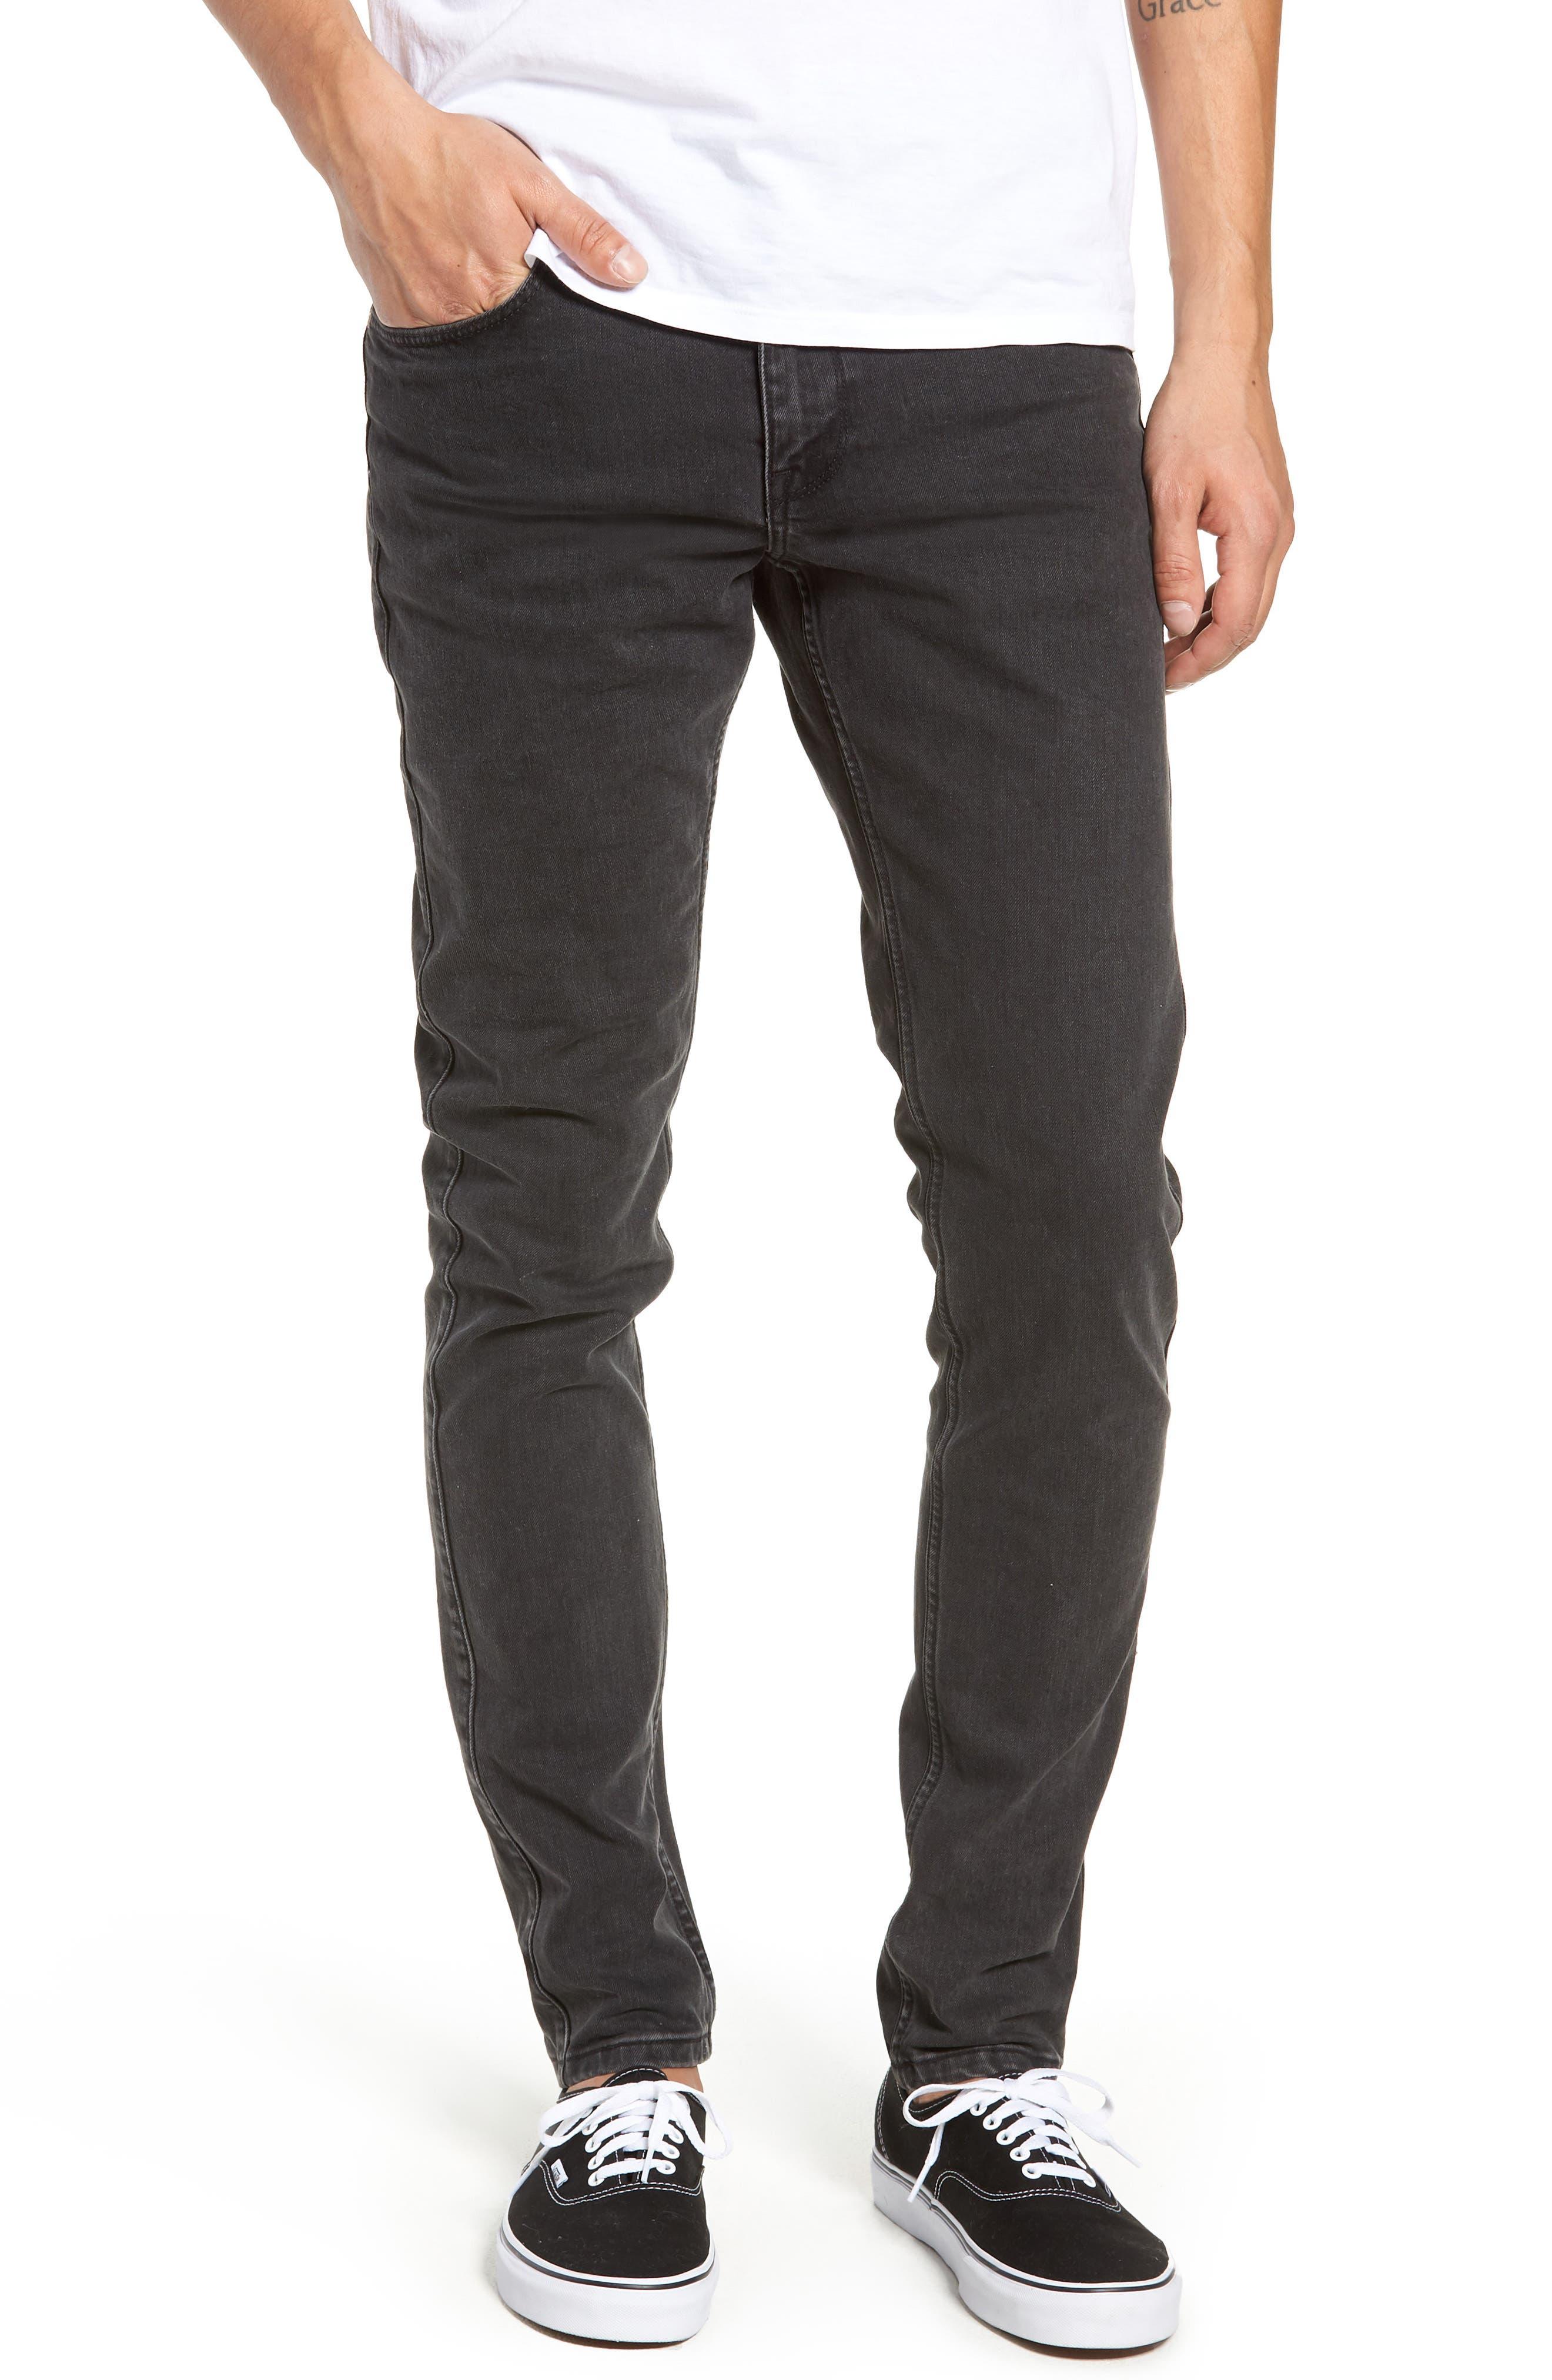 Clark Slim Straight Leg Jeans,                         Main,                         color, Black Vintage